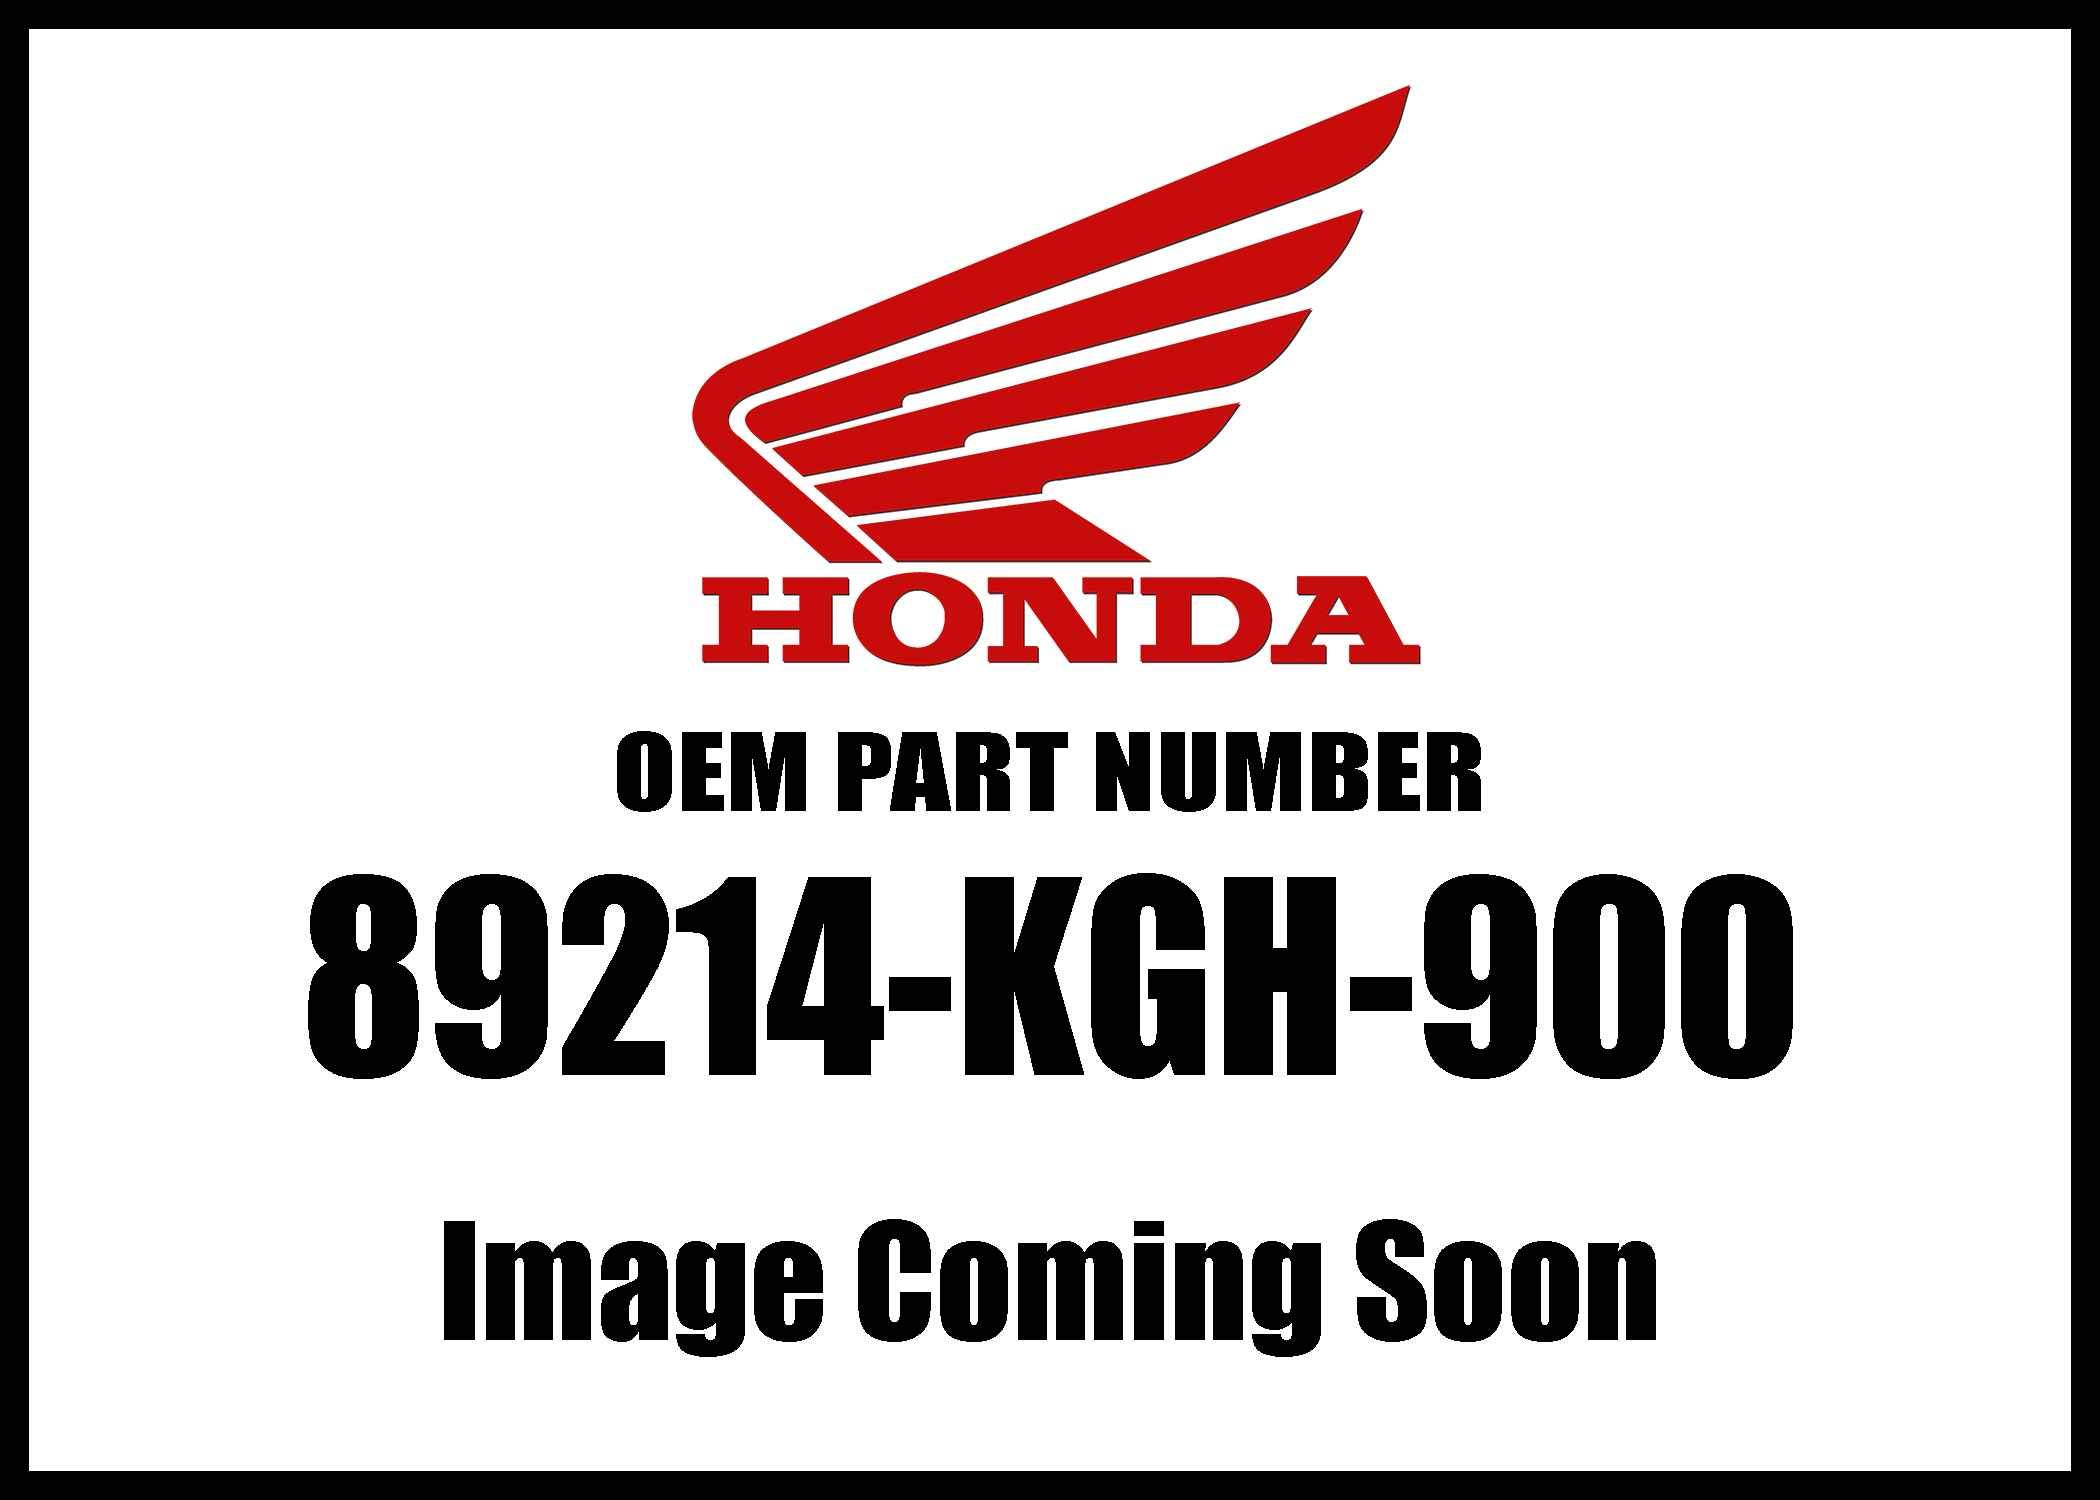 Honda Cbf300n '18 Screwdriver 1 89214-Kgh-900 New Oem